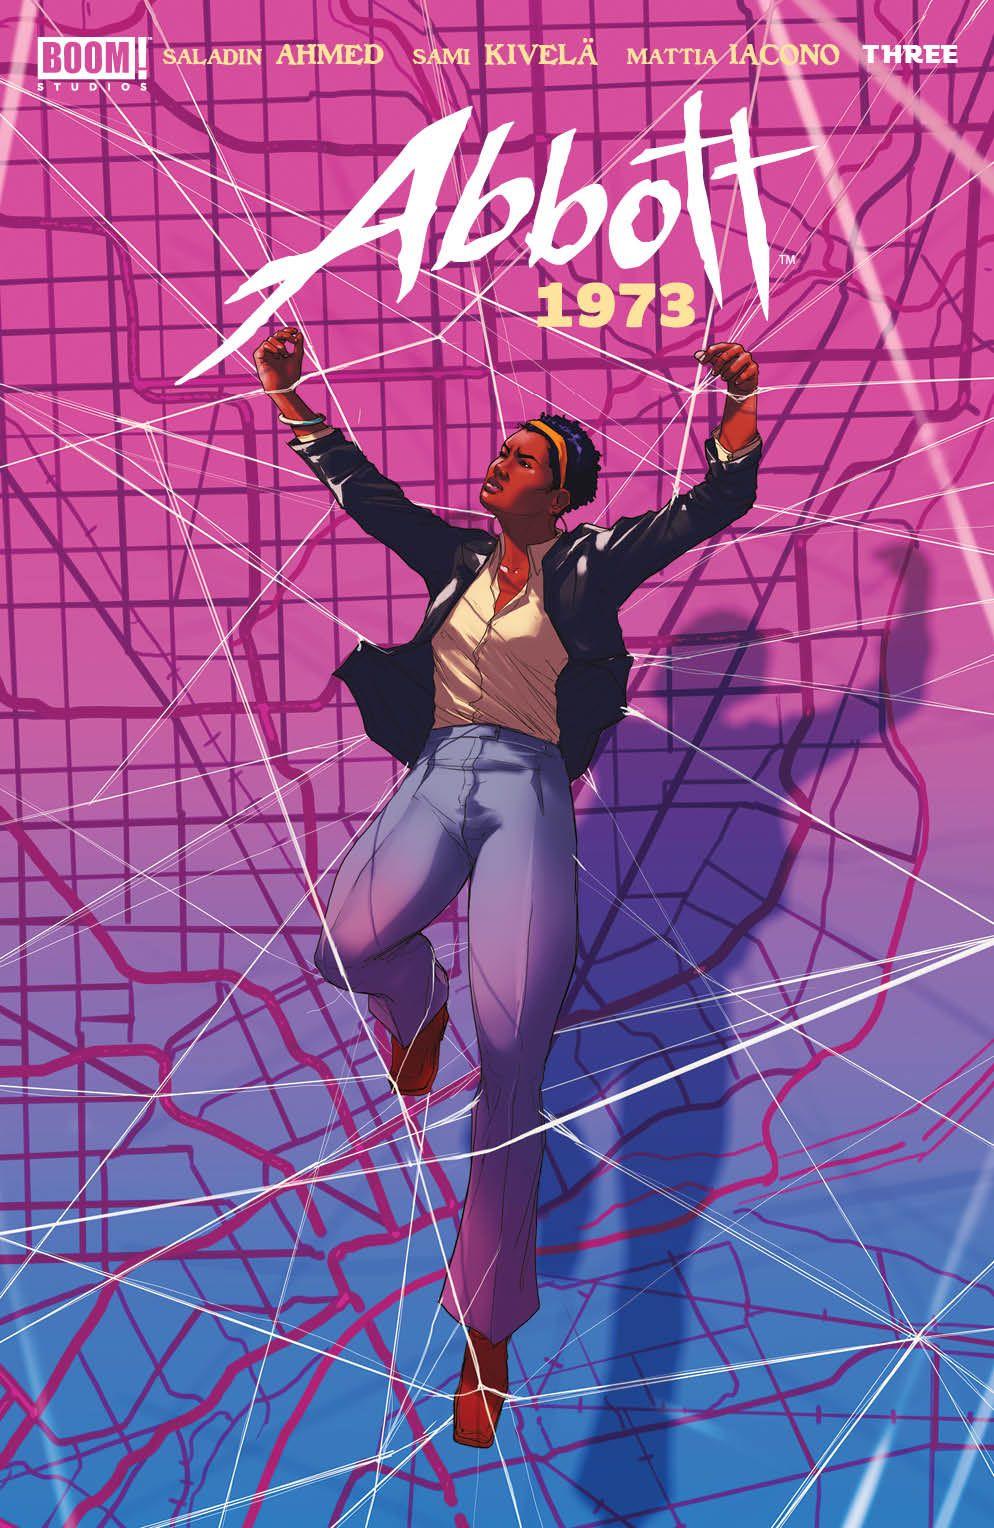 Abbott_1973_003_Cover_A_Main ComicList Previews: ABBOTT 1973 #3 (OF 5)